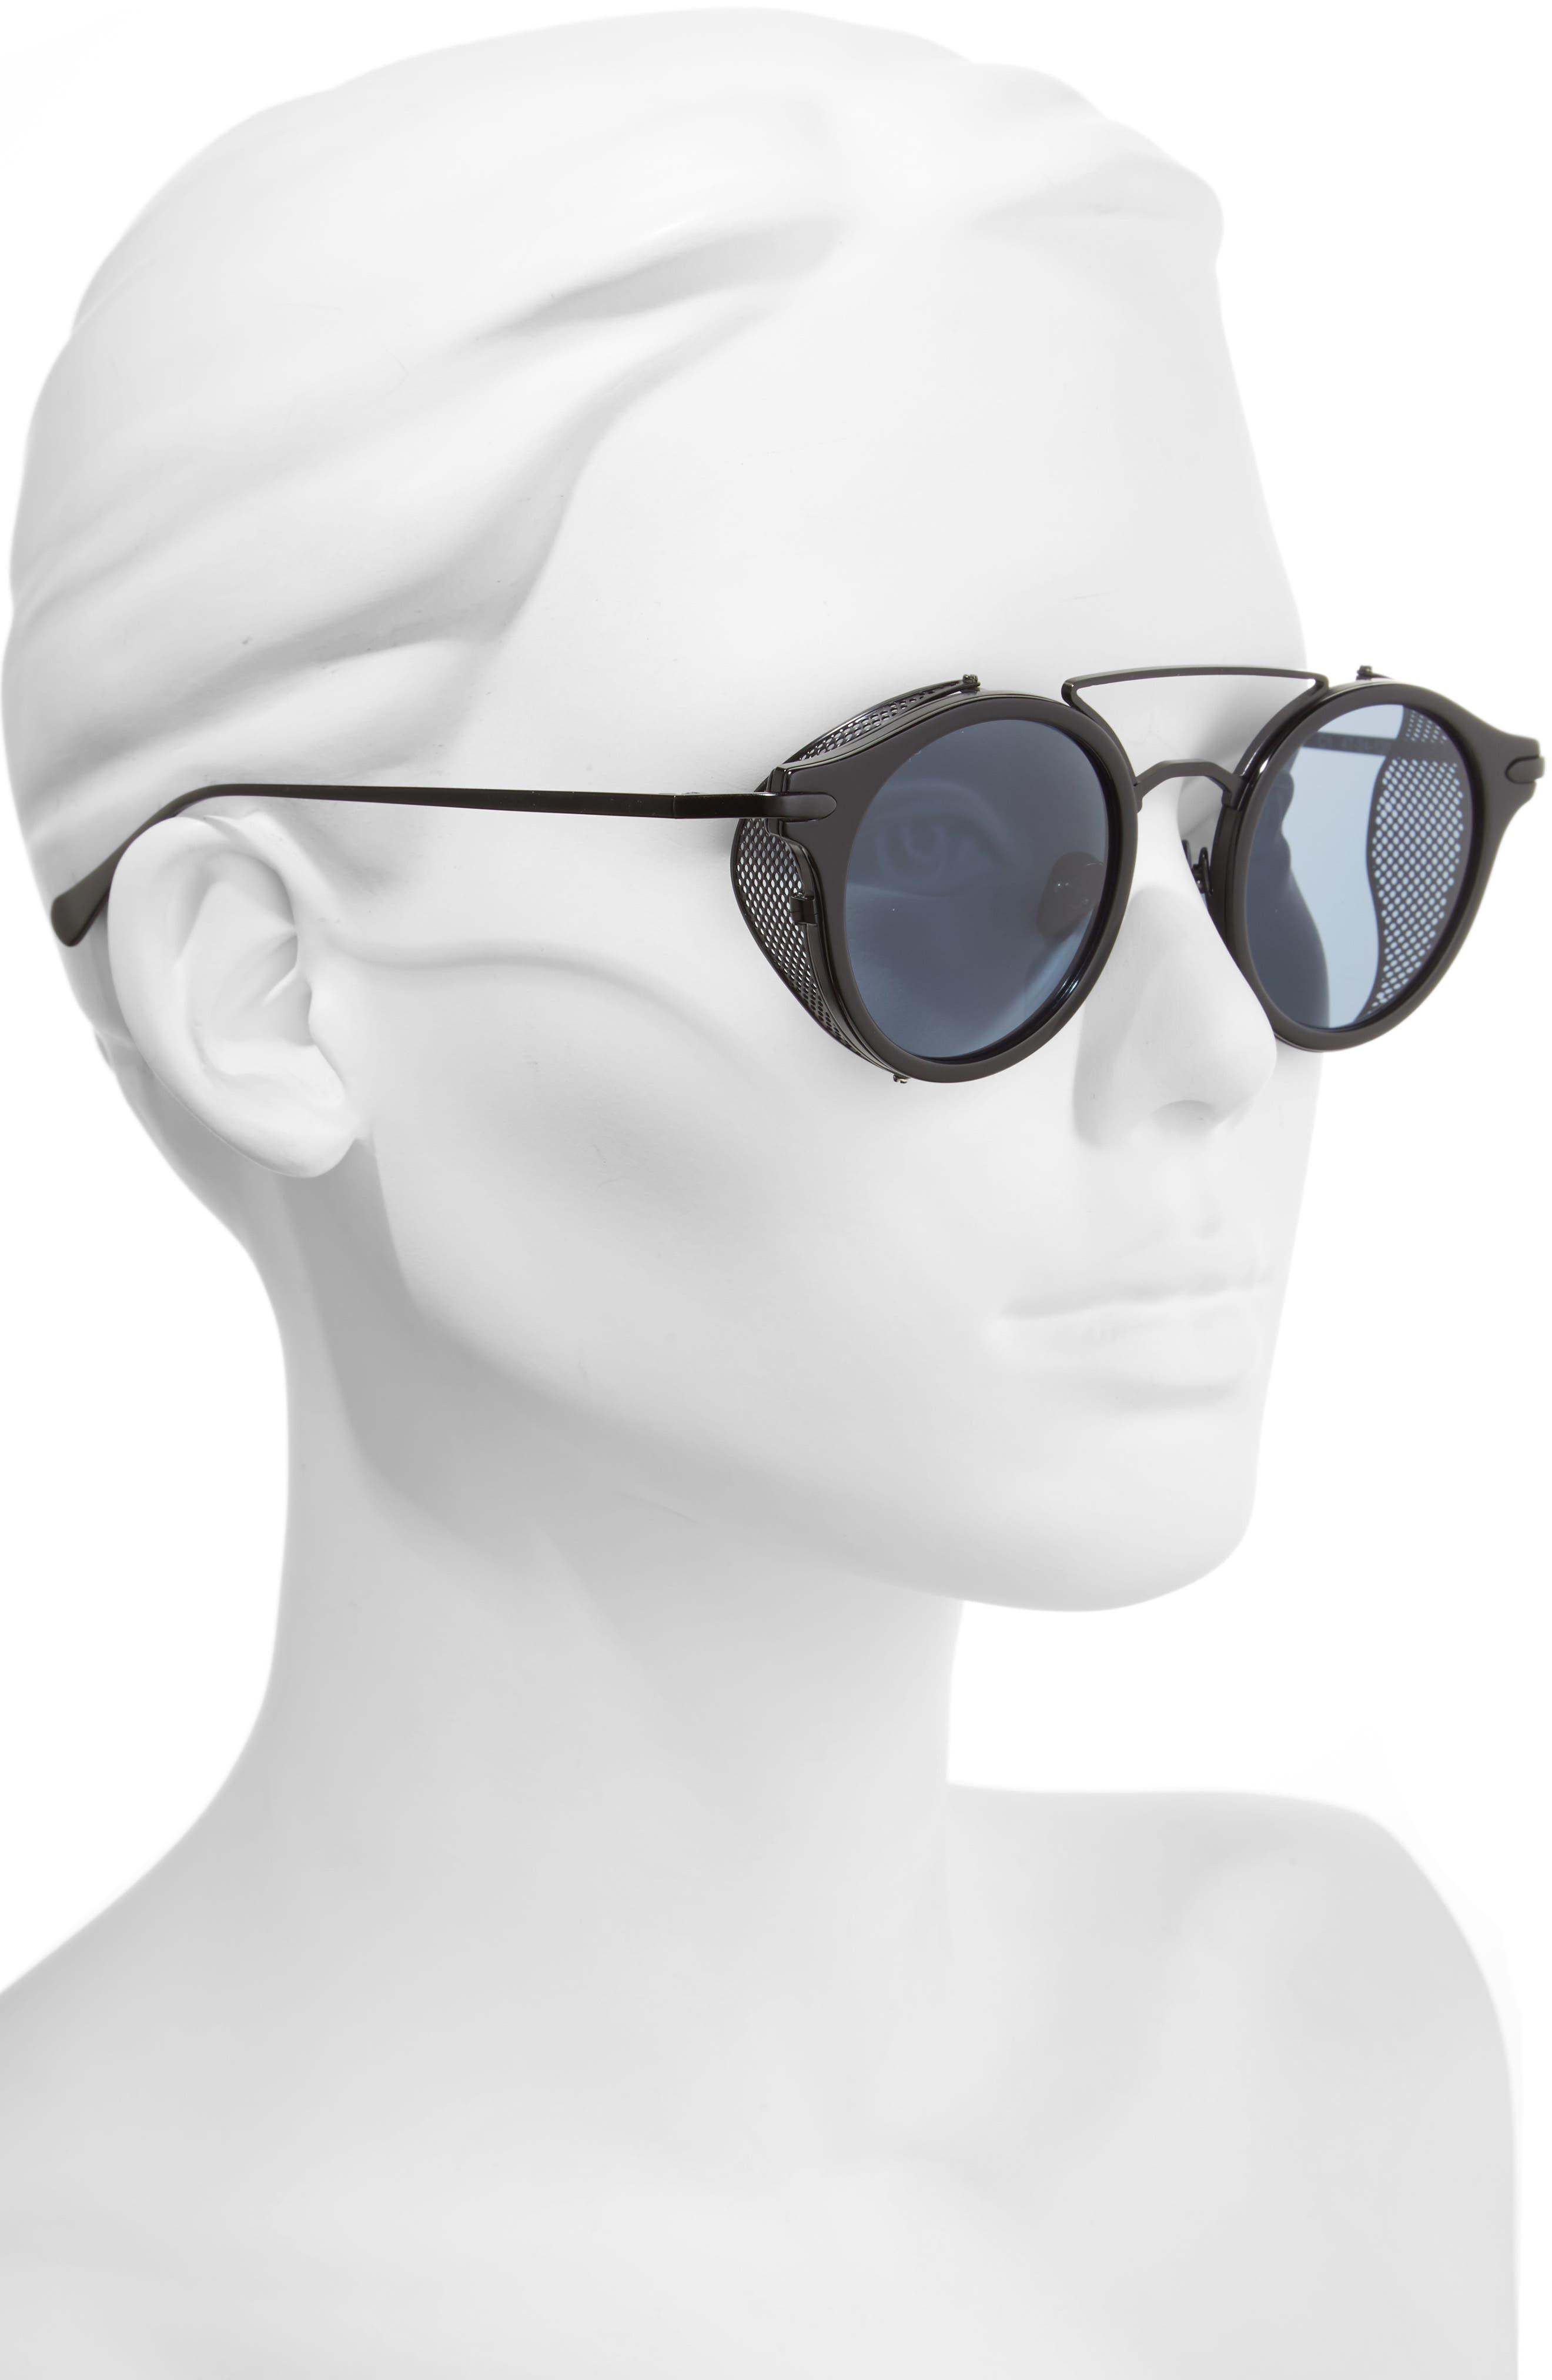 Mile High 47mm Sunglasses,                             Alternate thumbnail 2, color,                             001